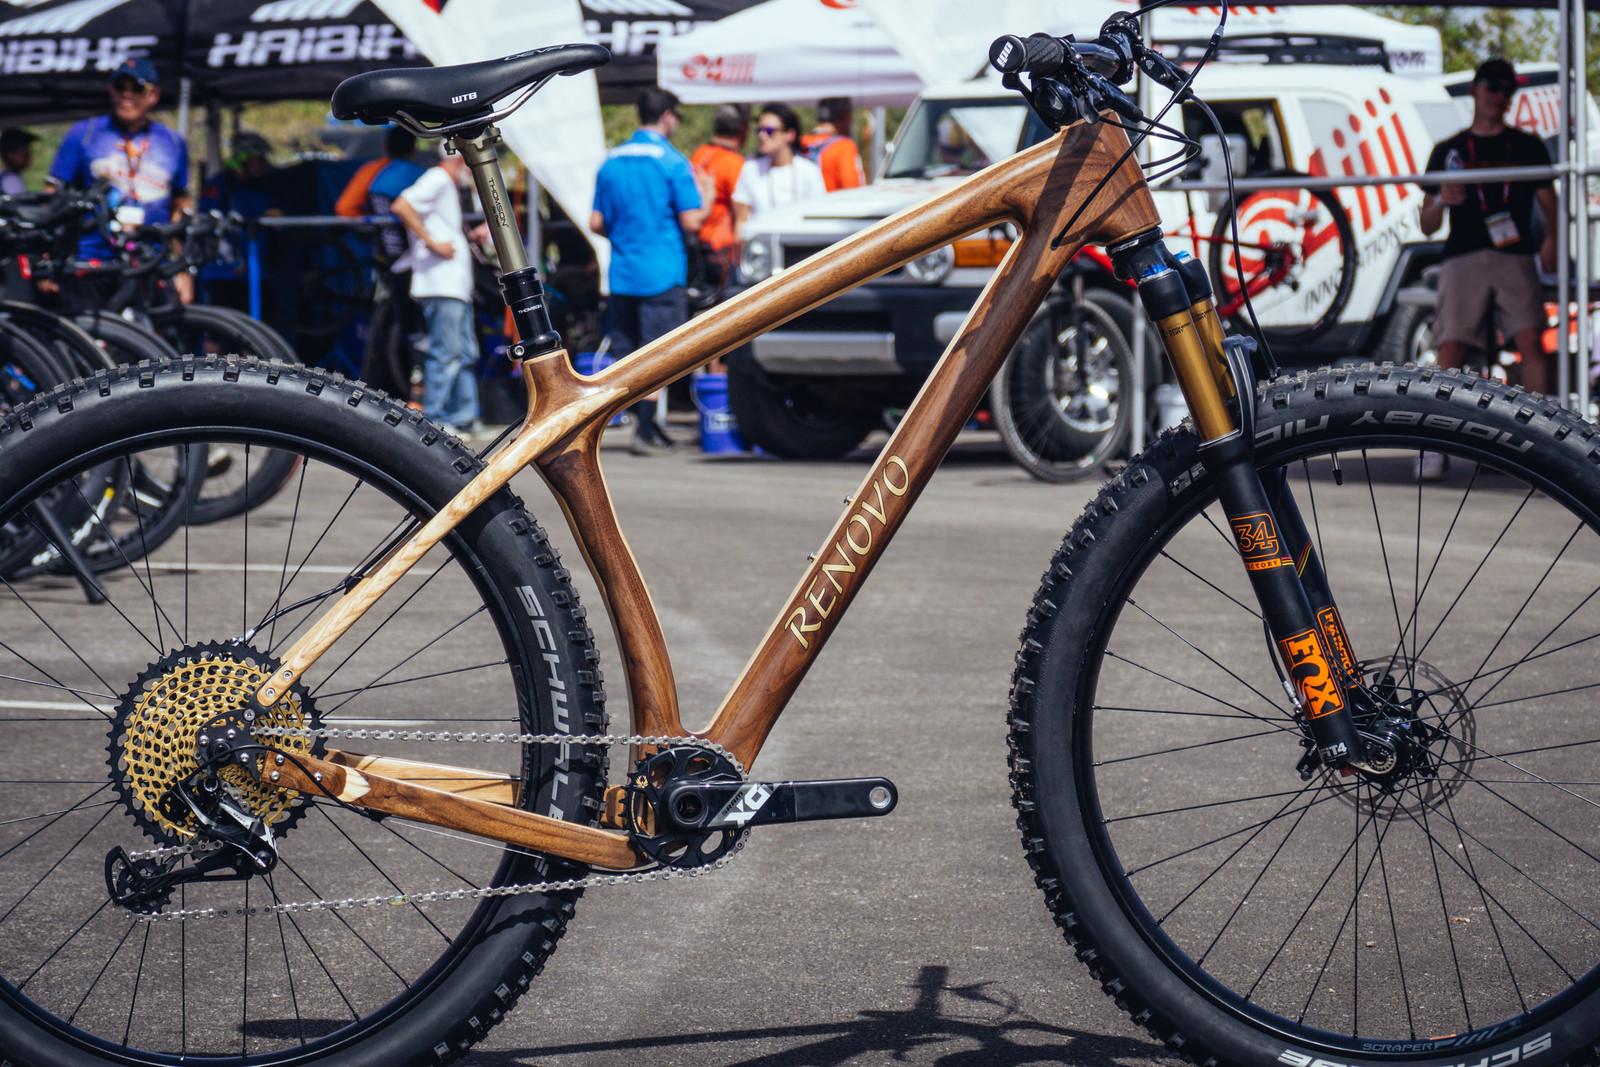 Renovo Wooden Bicycles - INTERBIKE - 2017 Enduro and Trail Bikes - Mountain Biking Pictures - Vital MTB